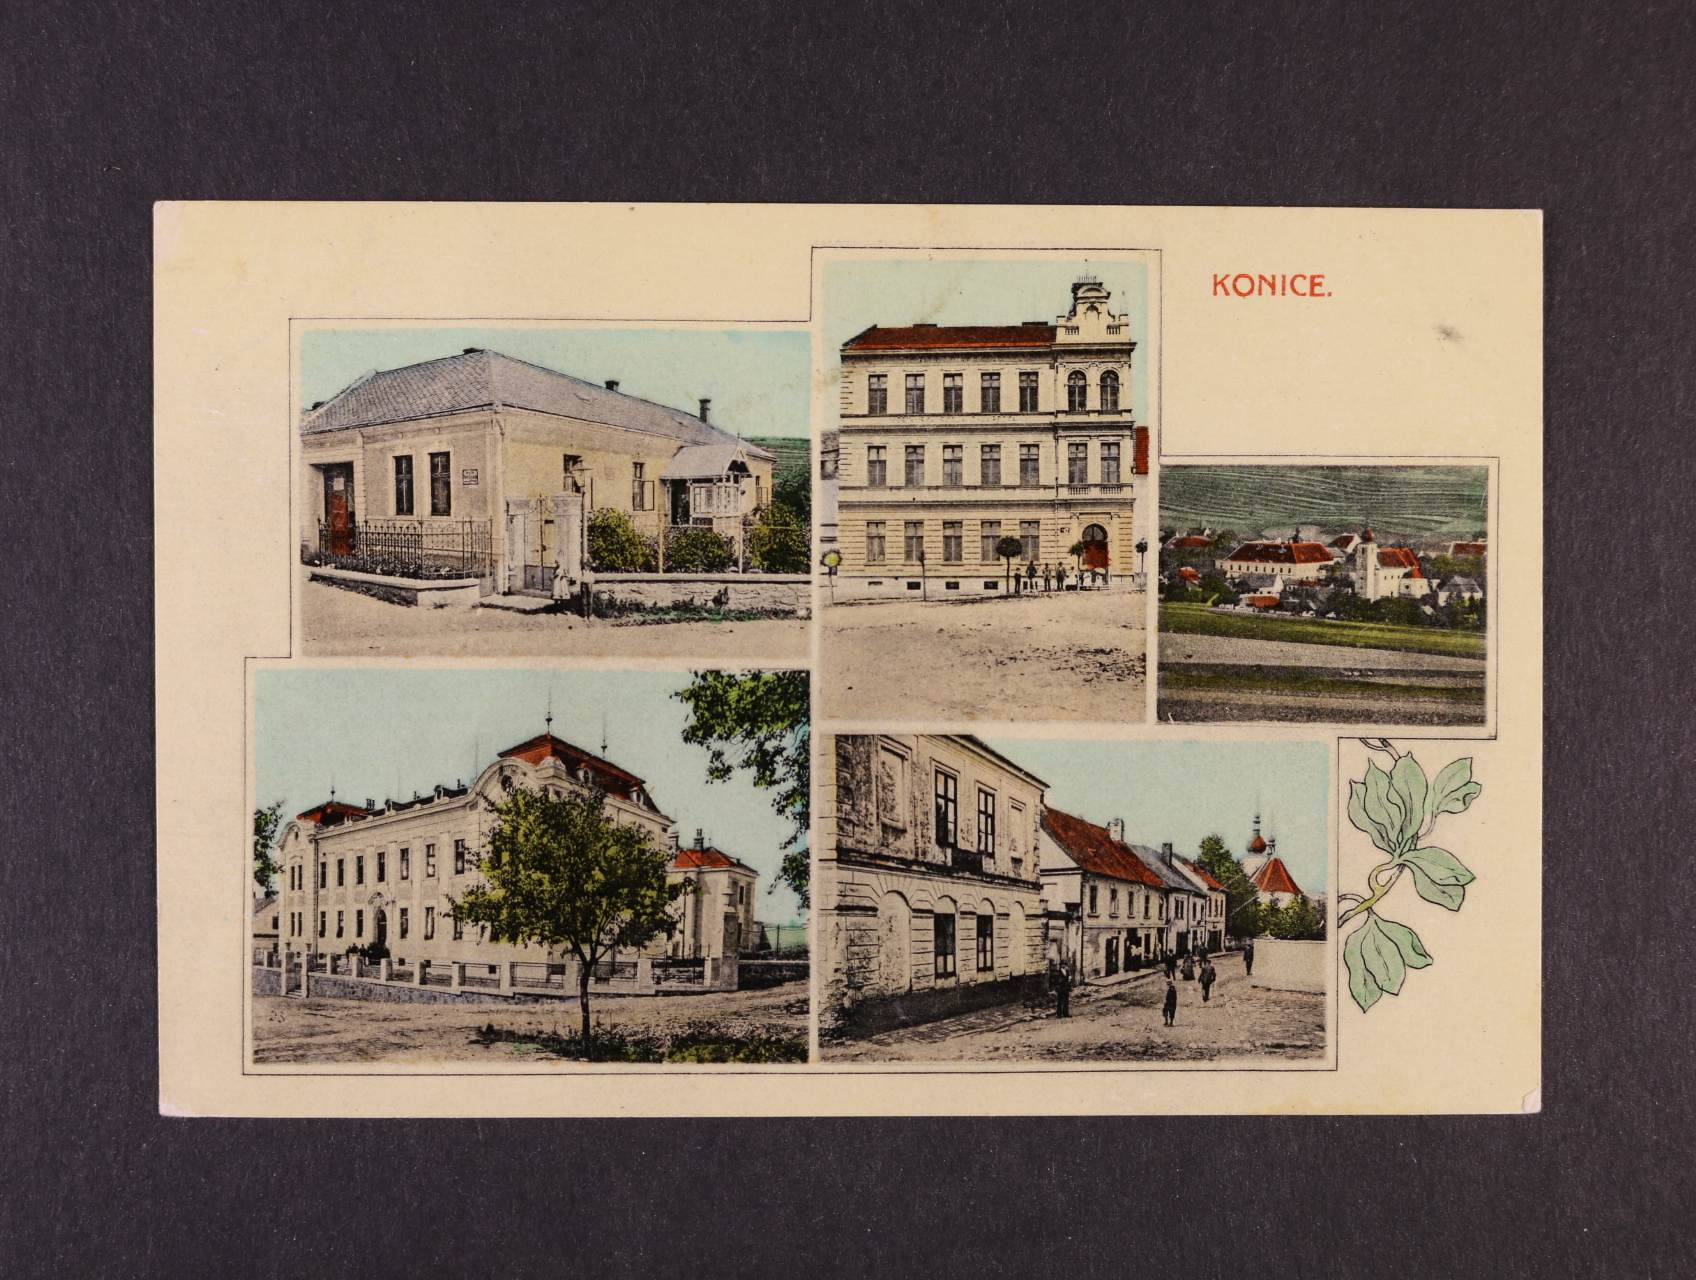 Konice - bar. okénková koláž, použitá 1906, dobrá kvalita